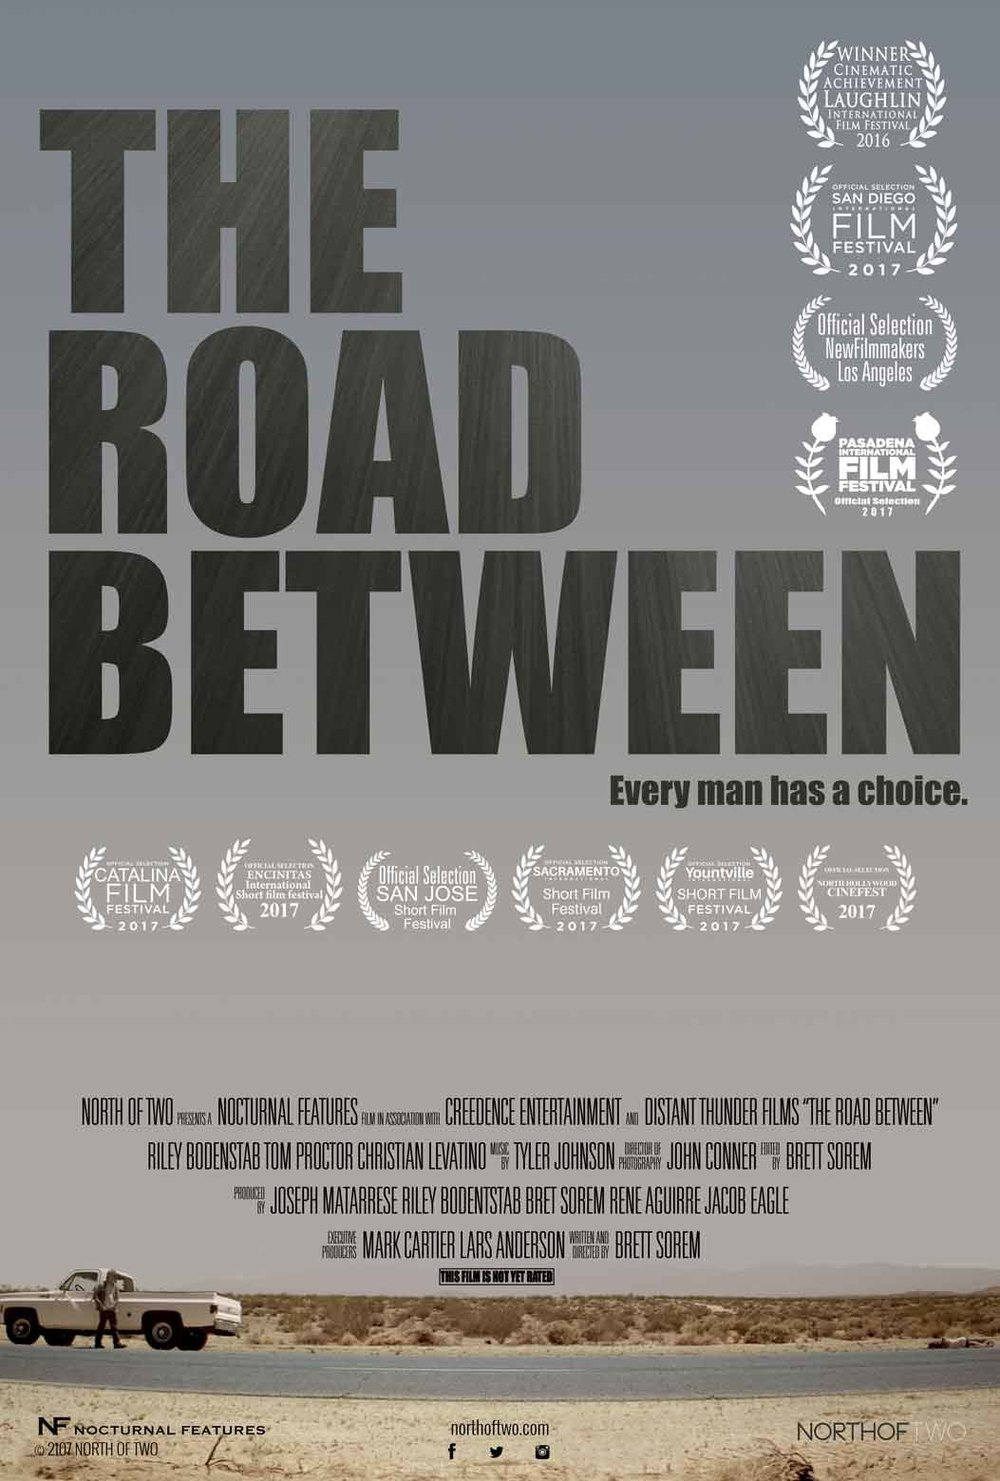 Road-Between-POSTER-Web_low.jpg